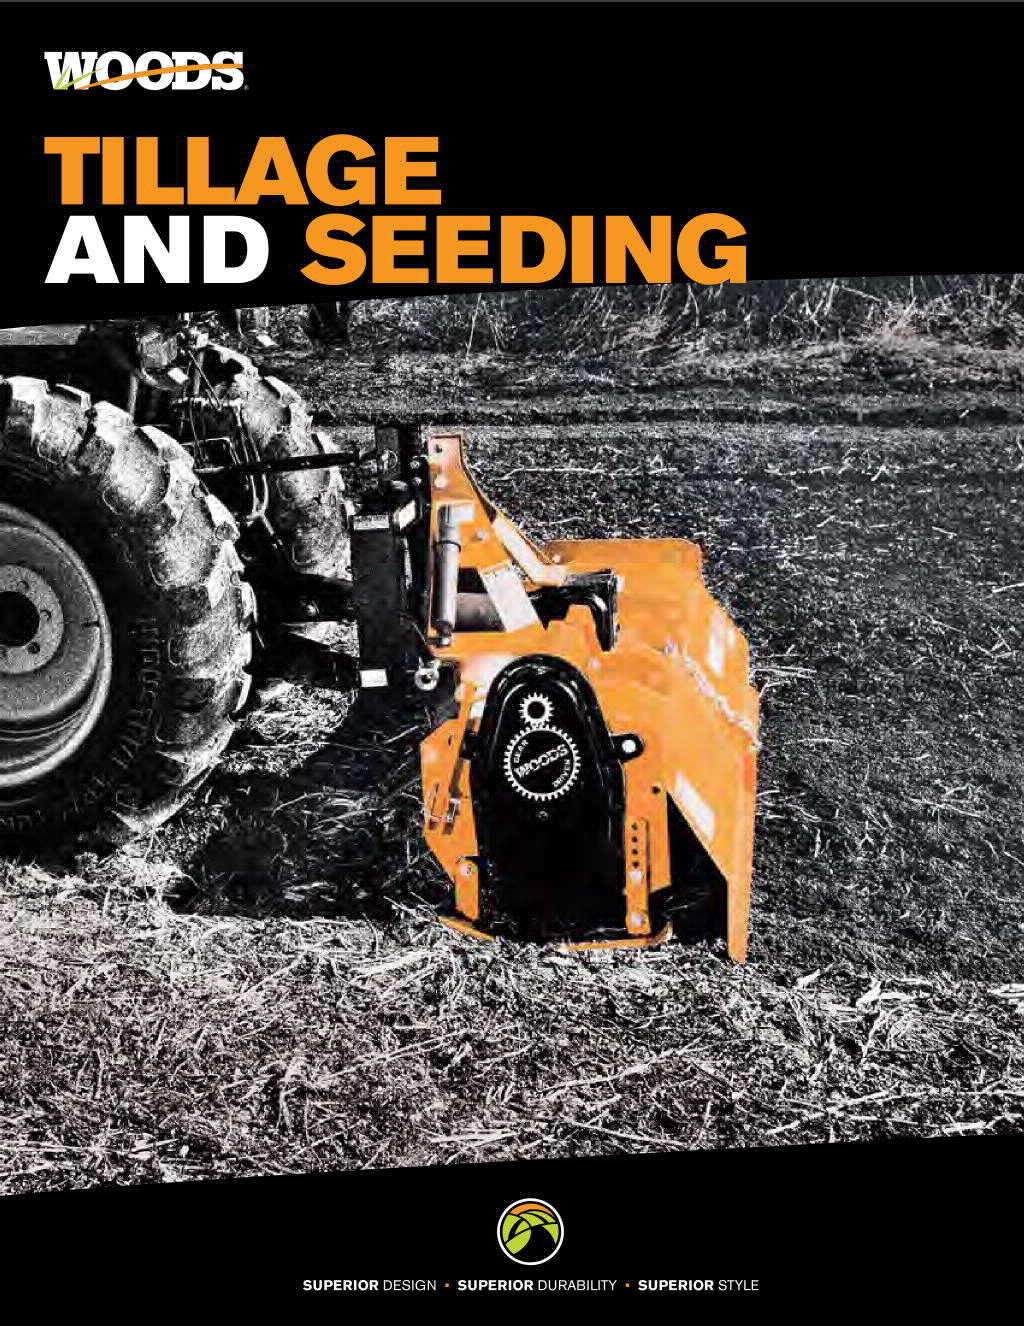 Tillage and Seeding Brochure